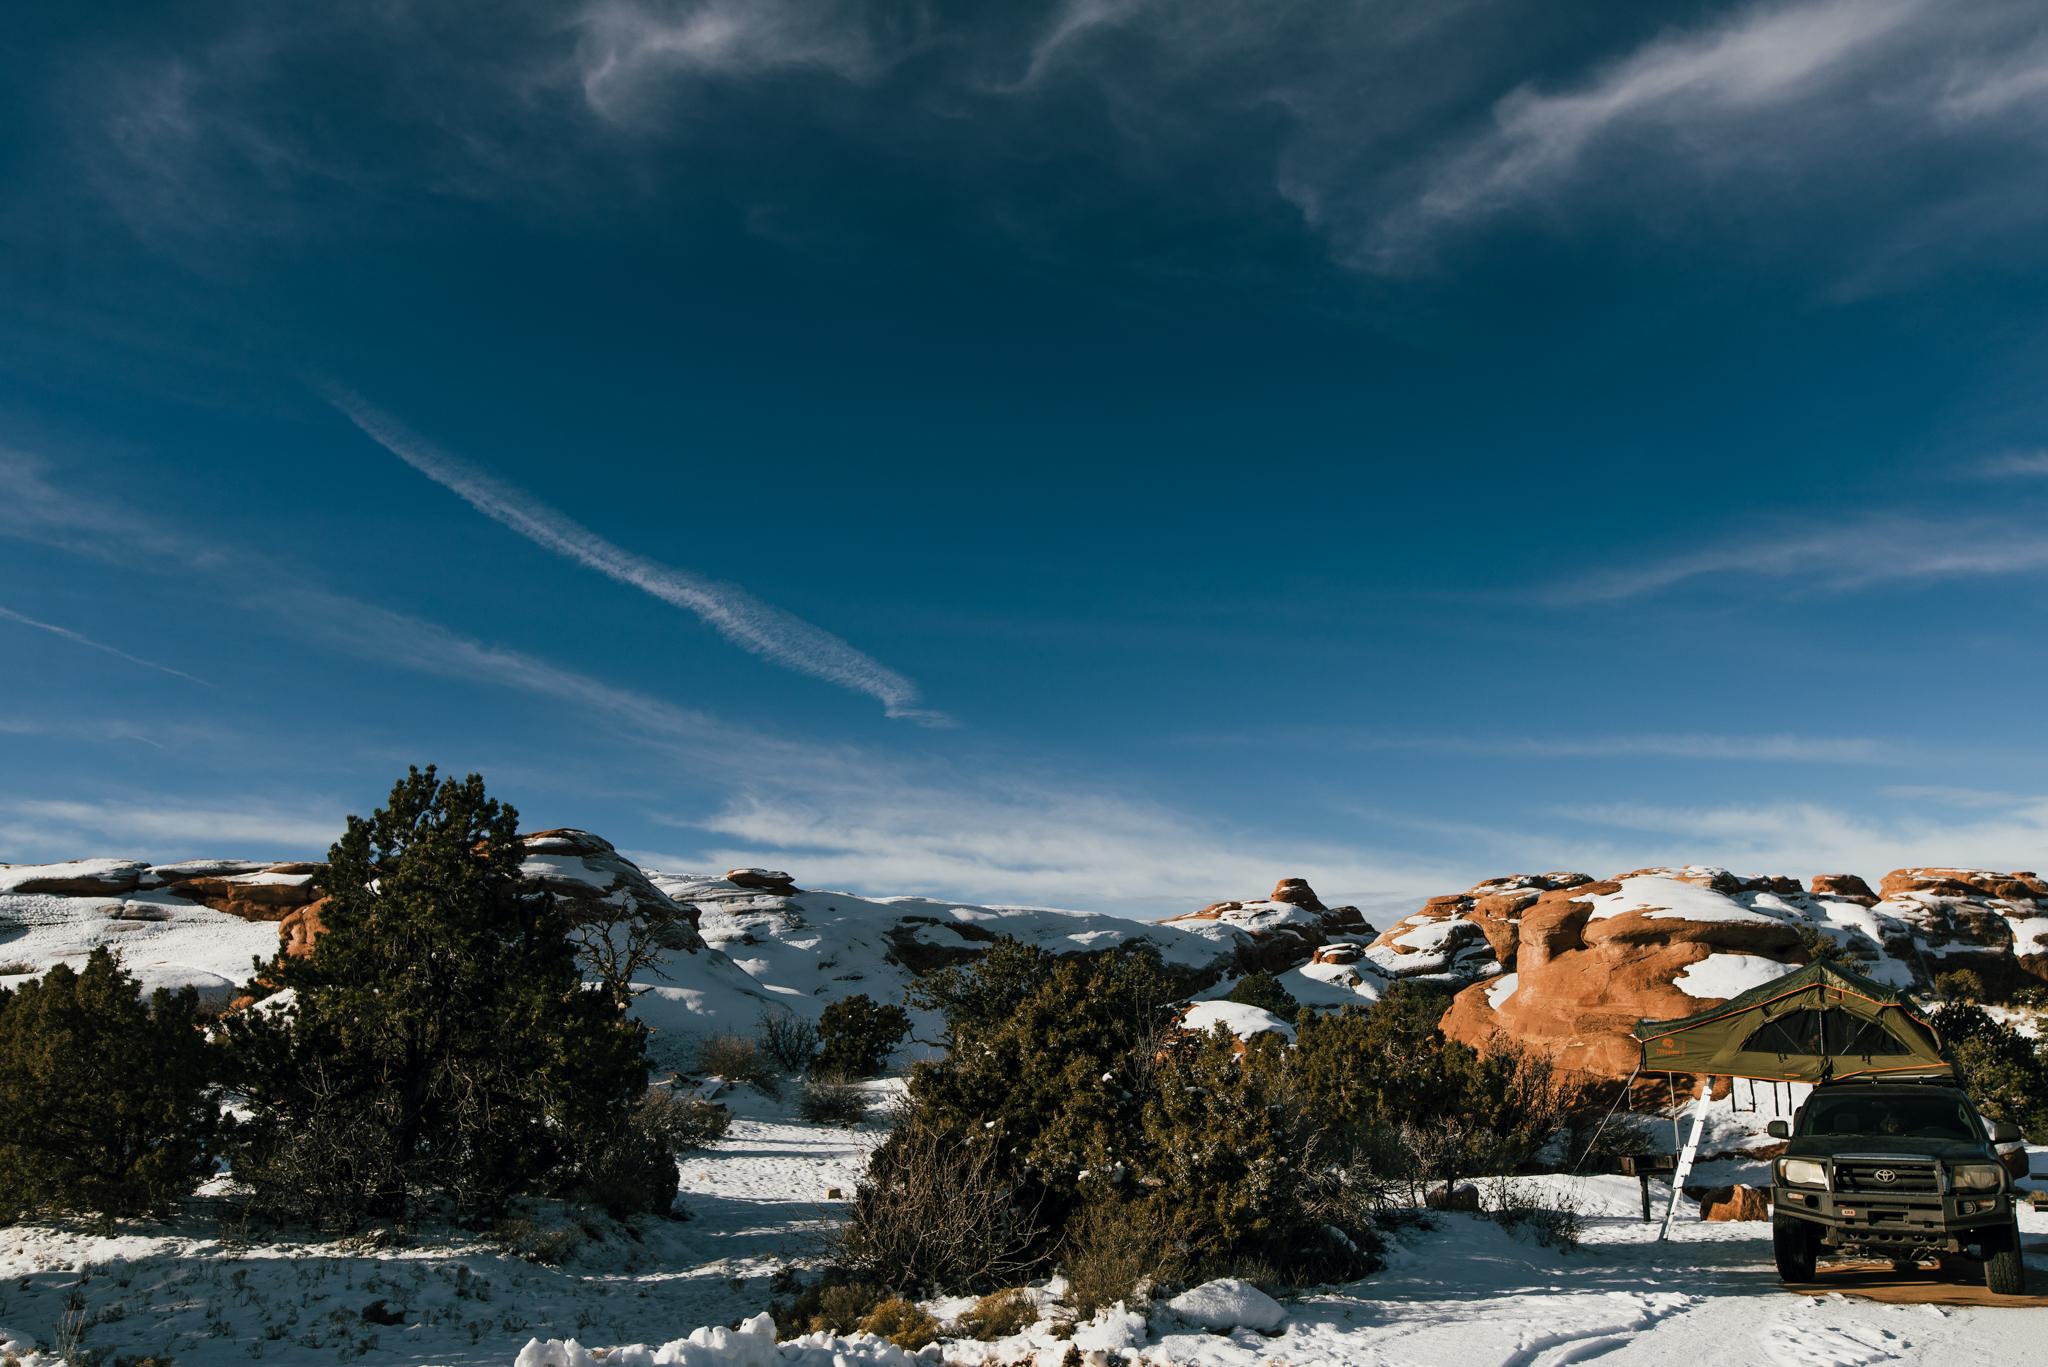 ©The-Ryans-Photography---Arches-National-Park-Moab-Utah-Travel-005.jpg